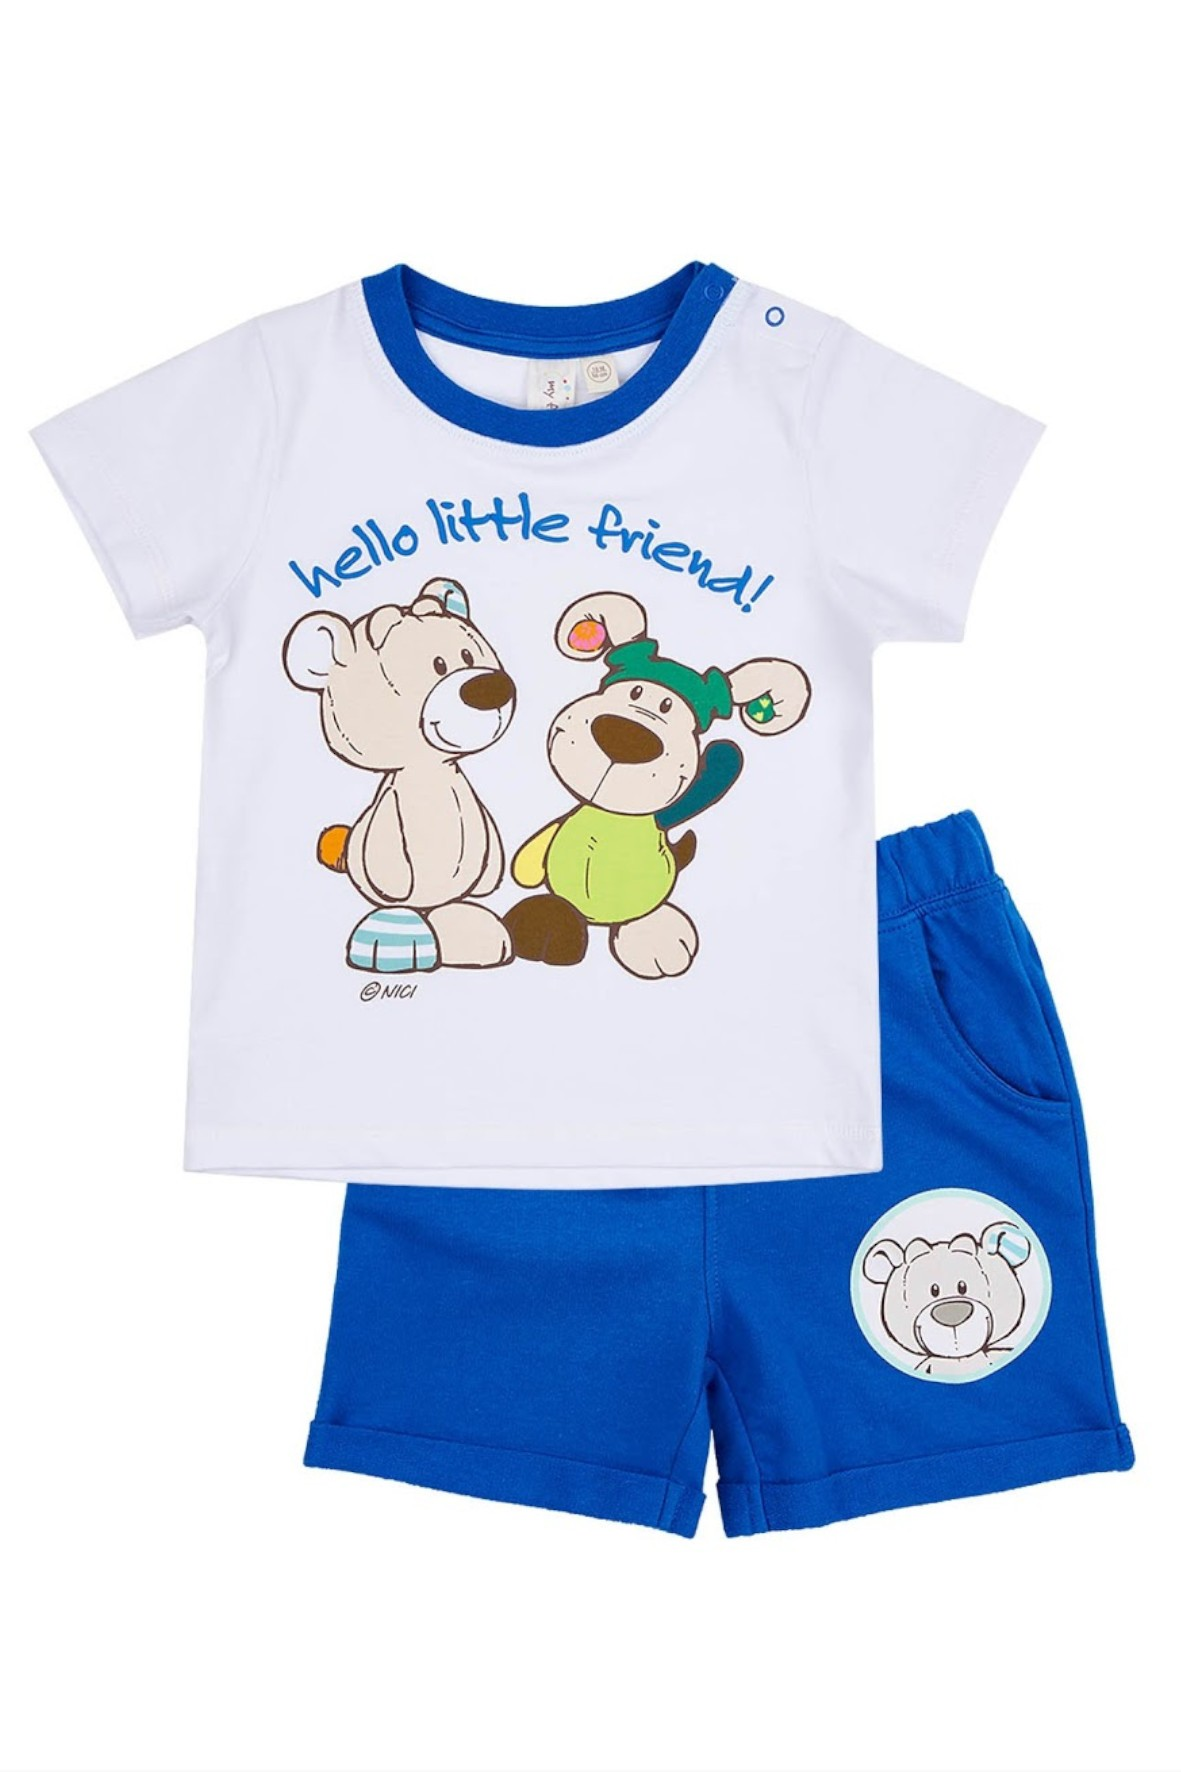 Komplet dla niemowlaka t-shirt i spodenki